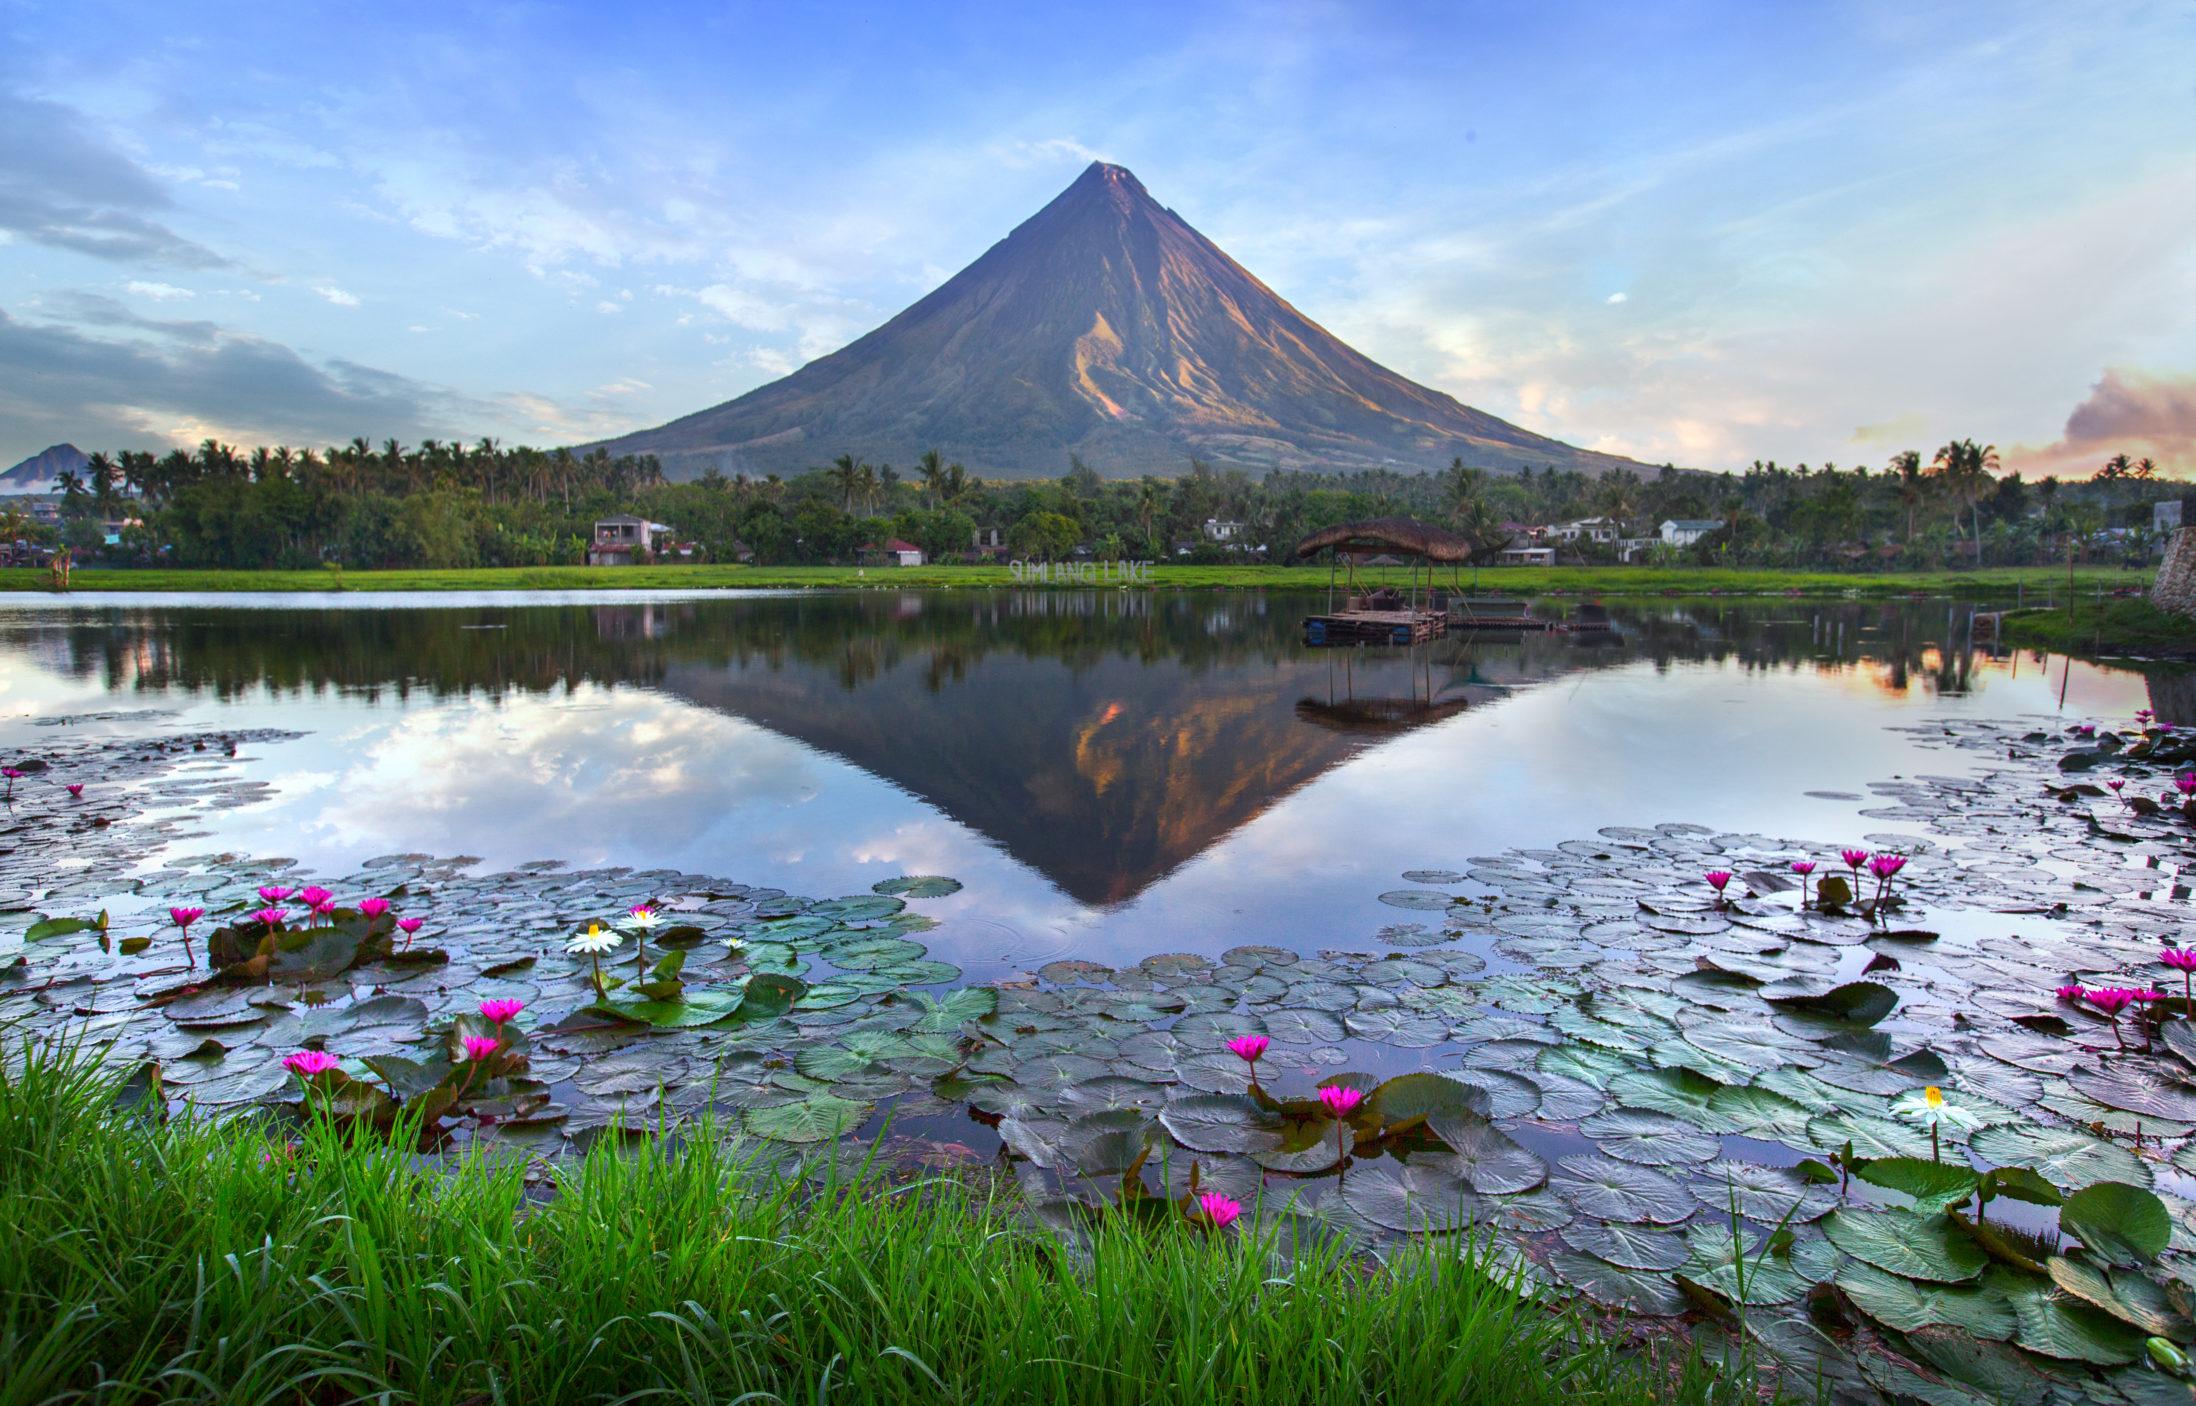 Philippines. [Shutterstock]